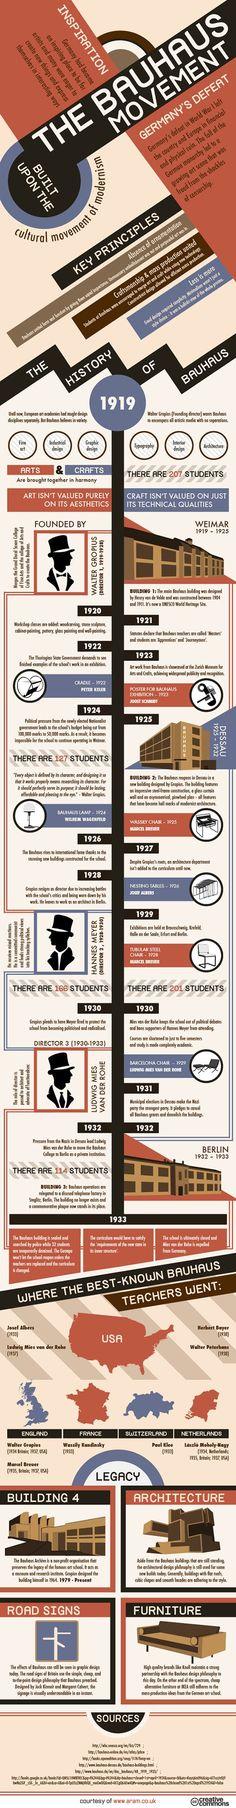 History of the Bauhaus design movement: